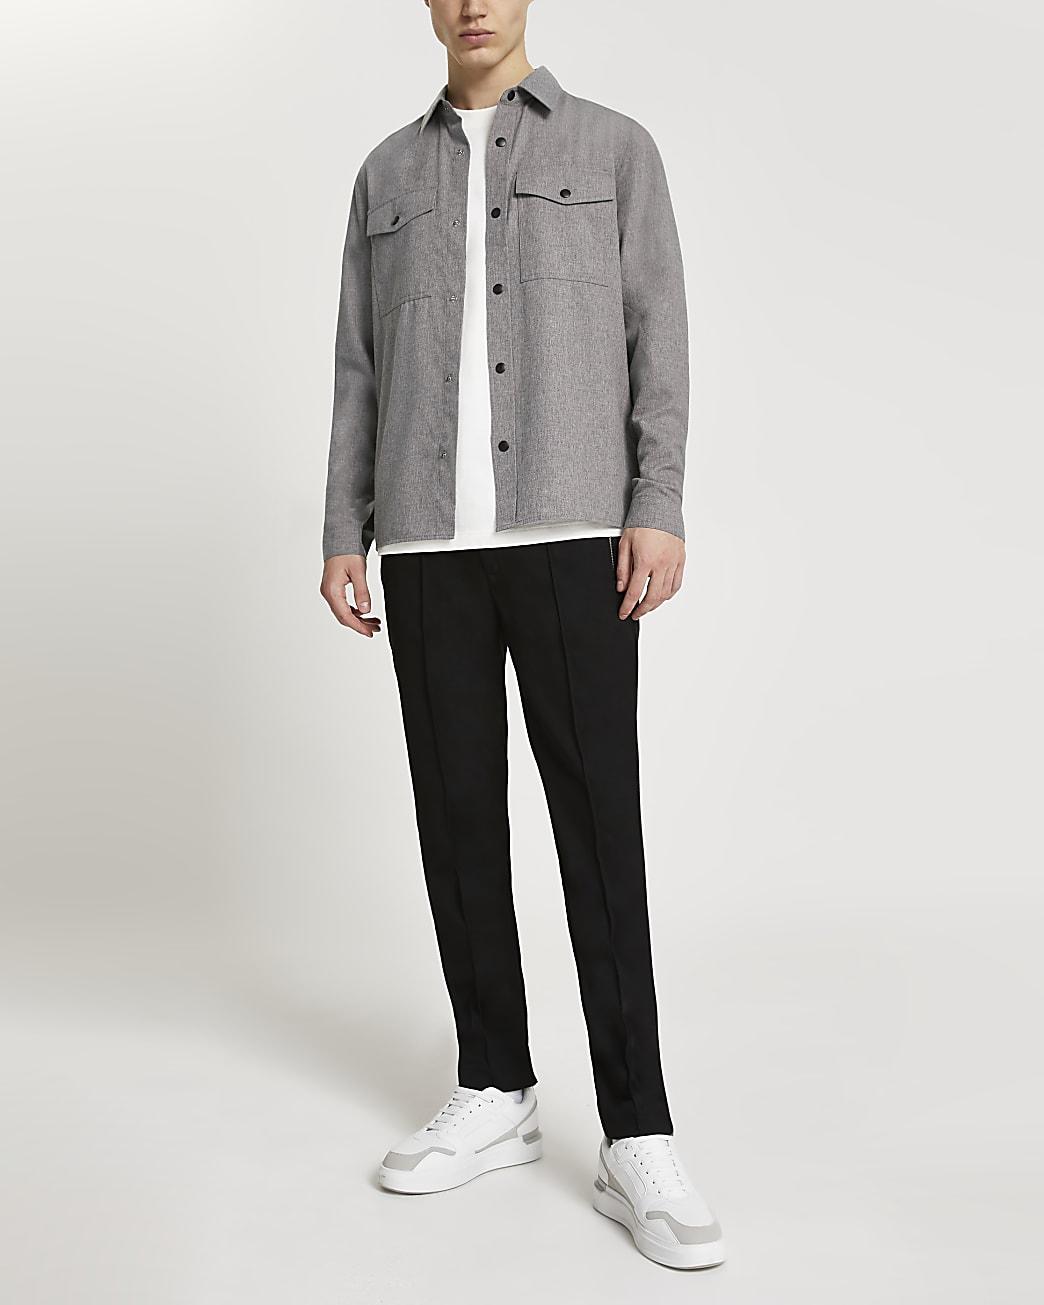 Grey long sleeve flannel shirt